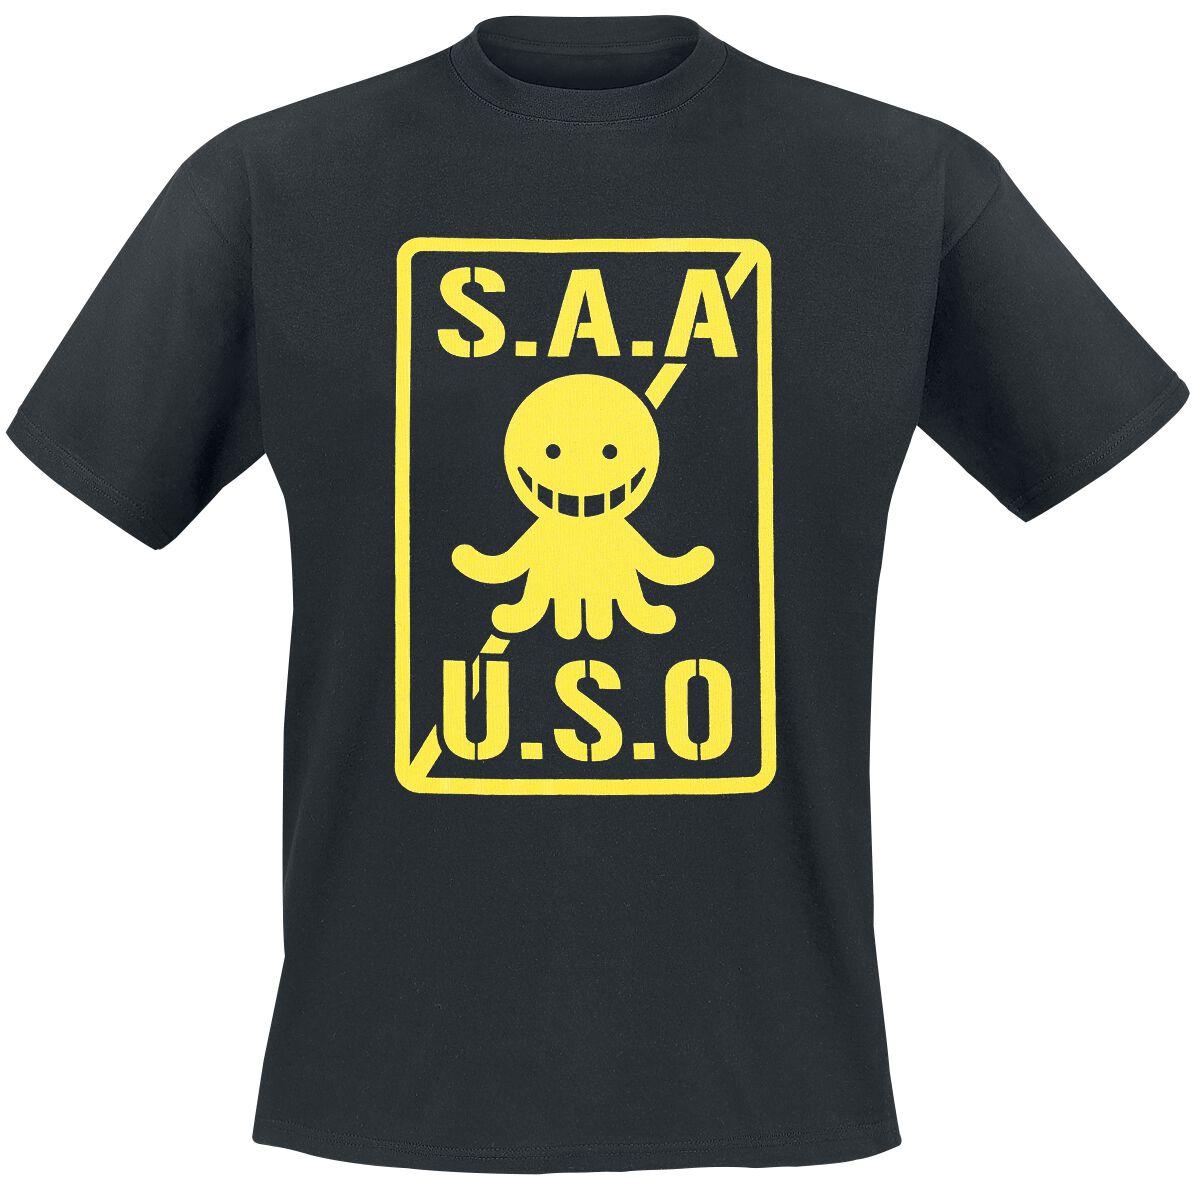 Merch dla Fanów - Koszulki - T-Shirt Assassination Classroom S.A.A.U.S.O. T-Shirt czarny - 352544